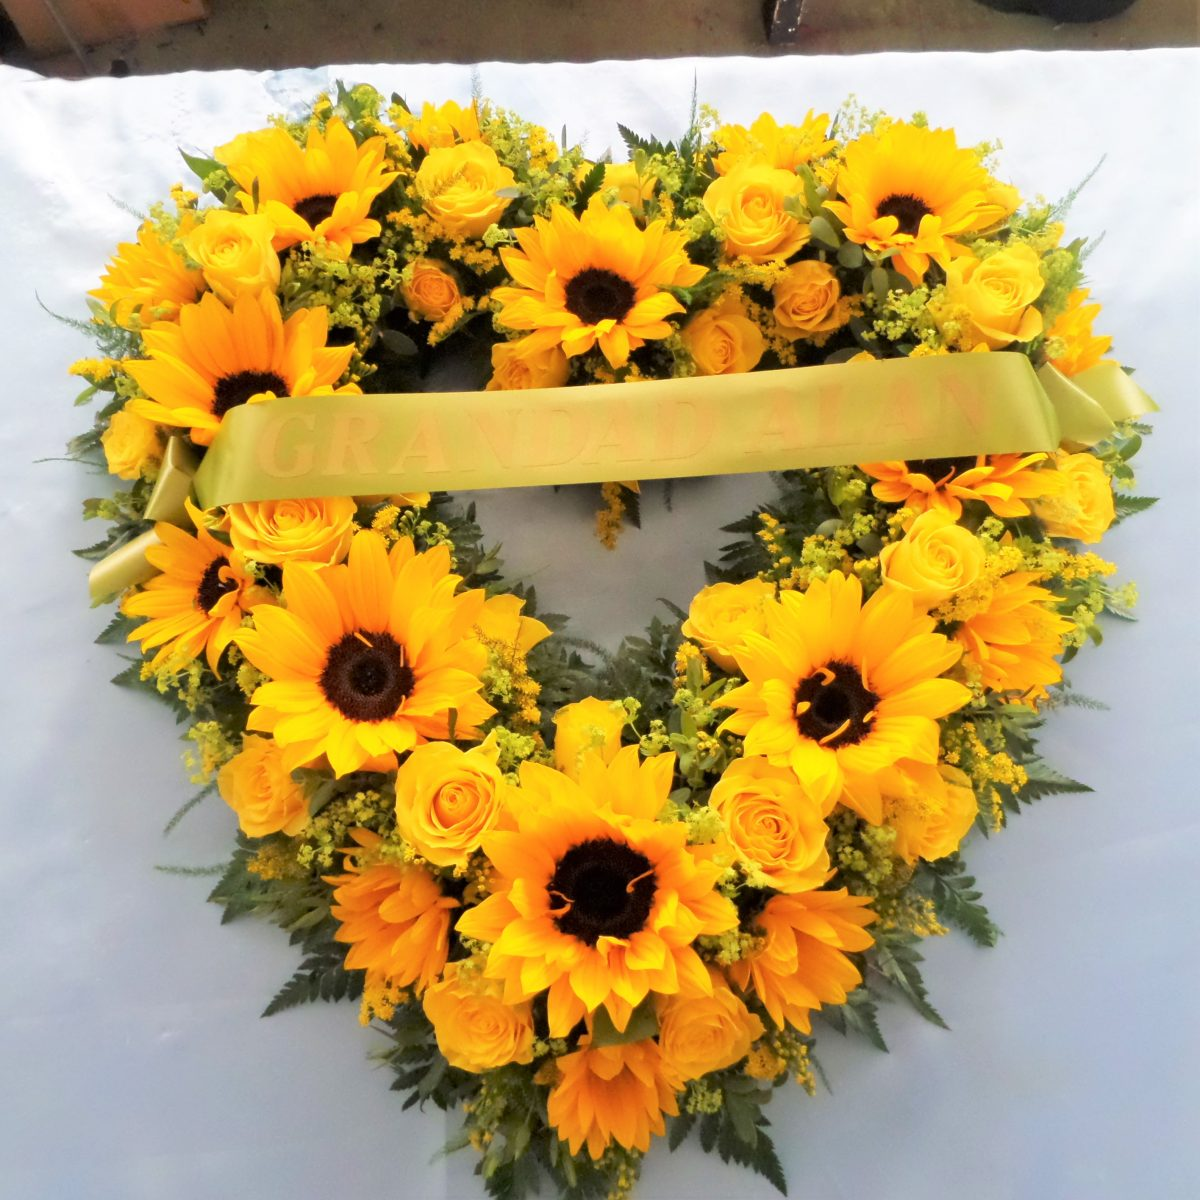 Bespoke heart tributes katherines florists bespoke heart tributes izmirmasajfo